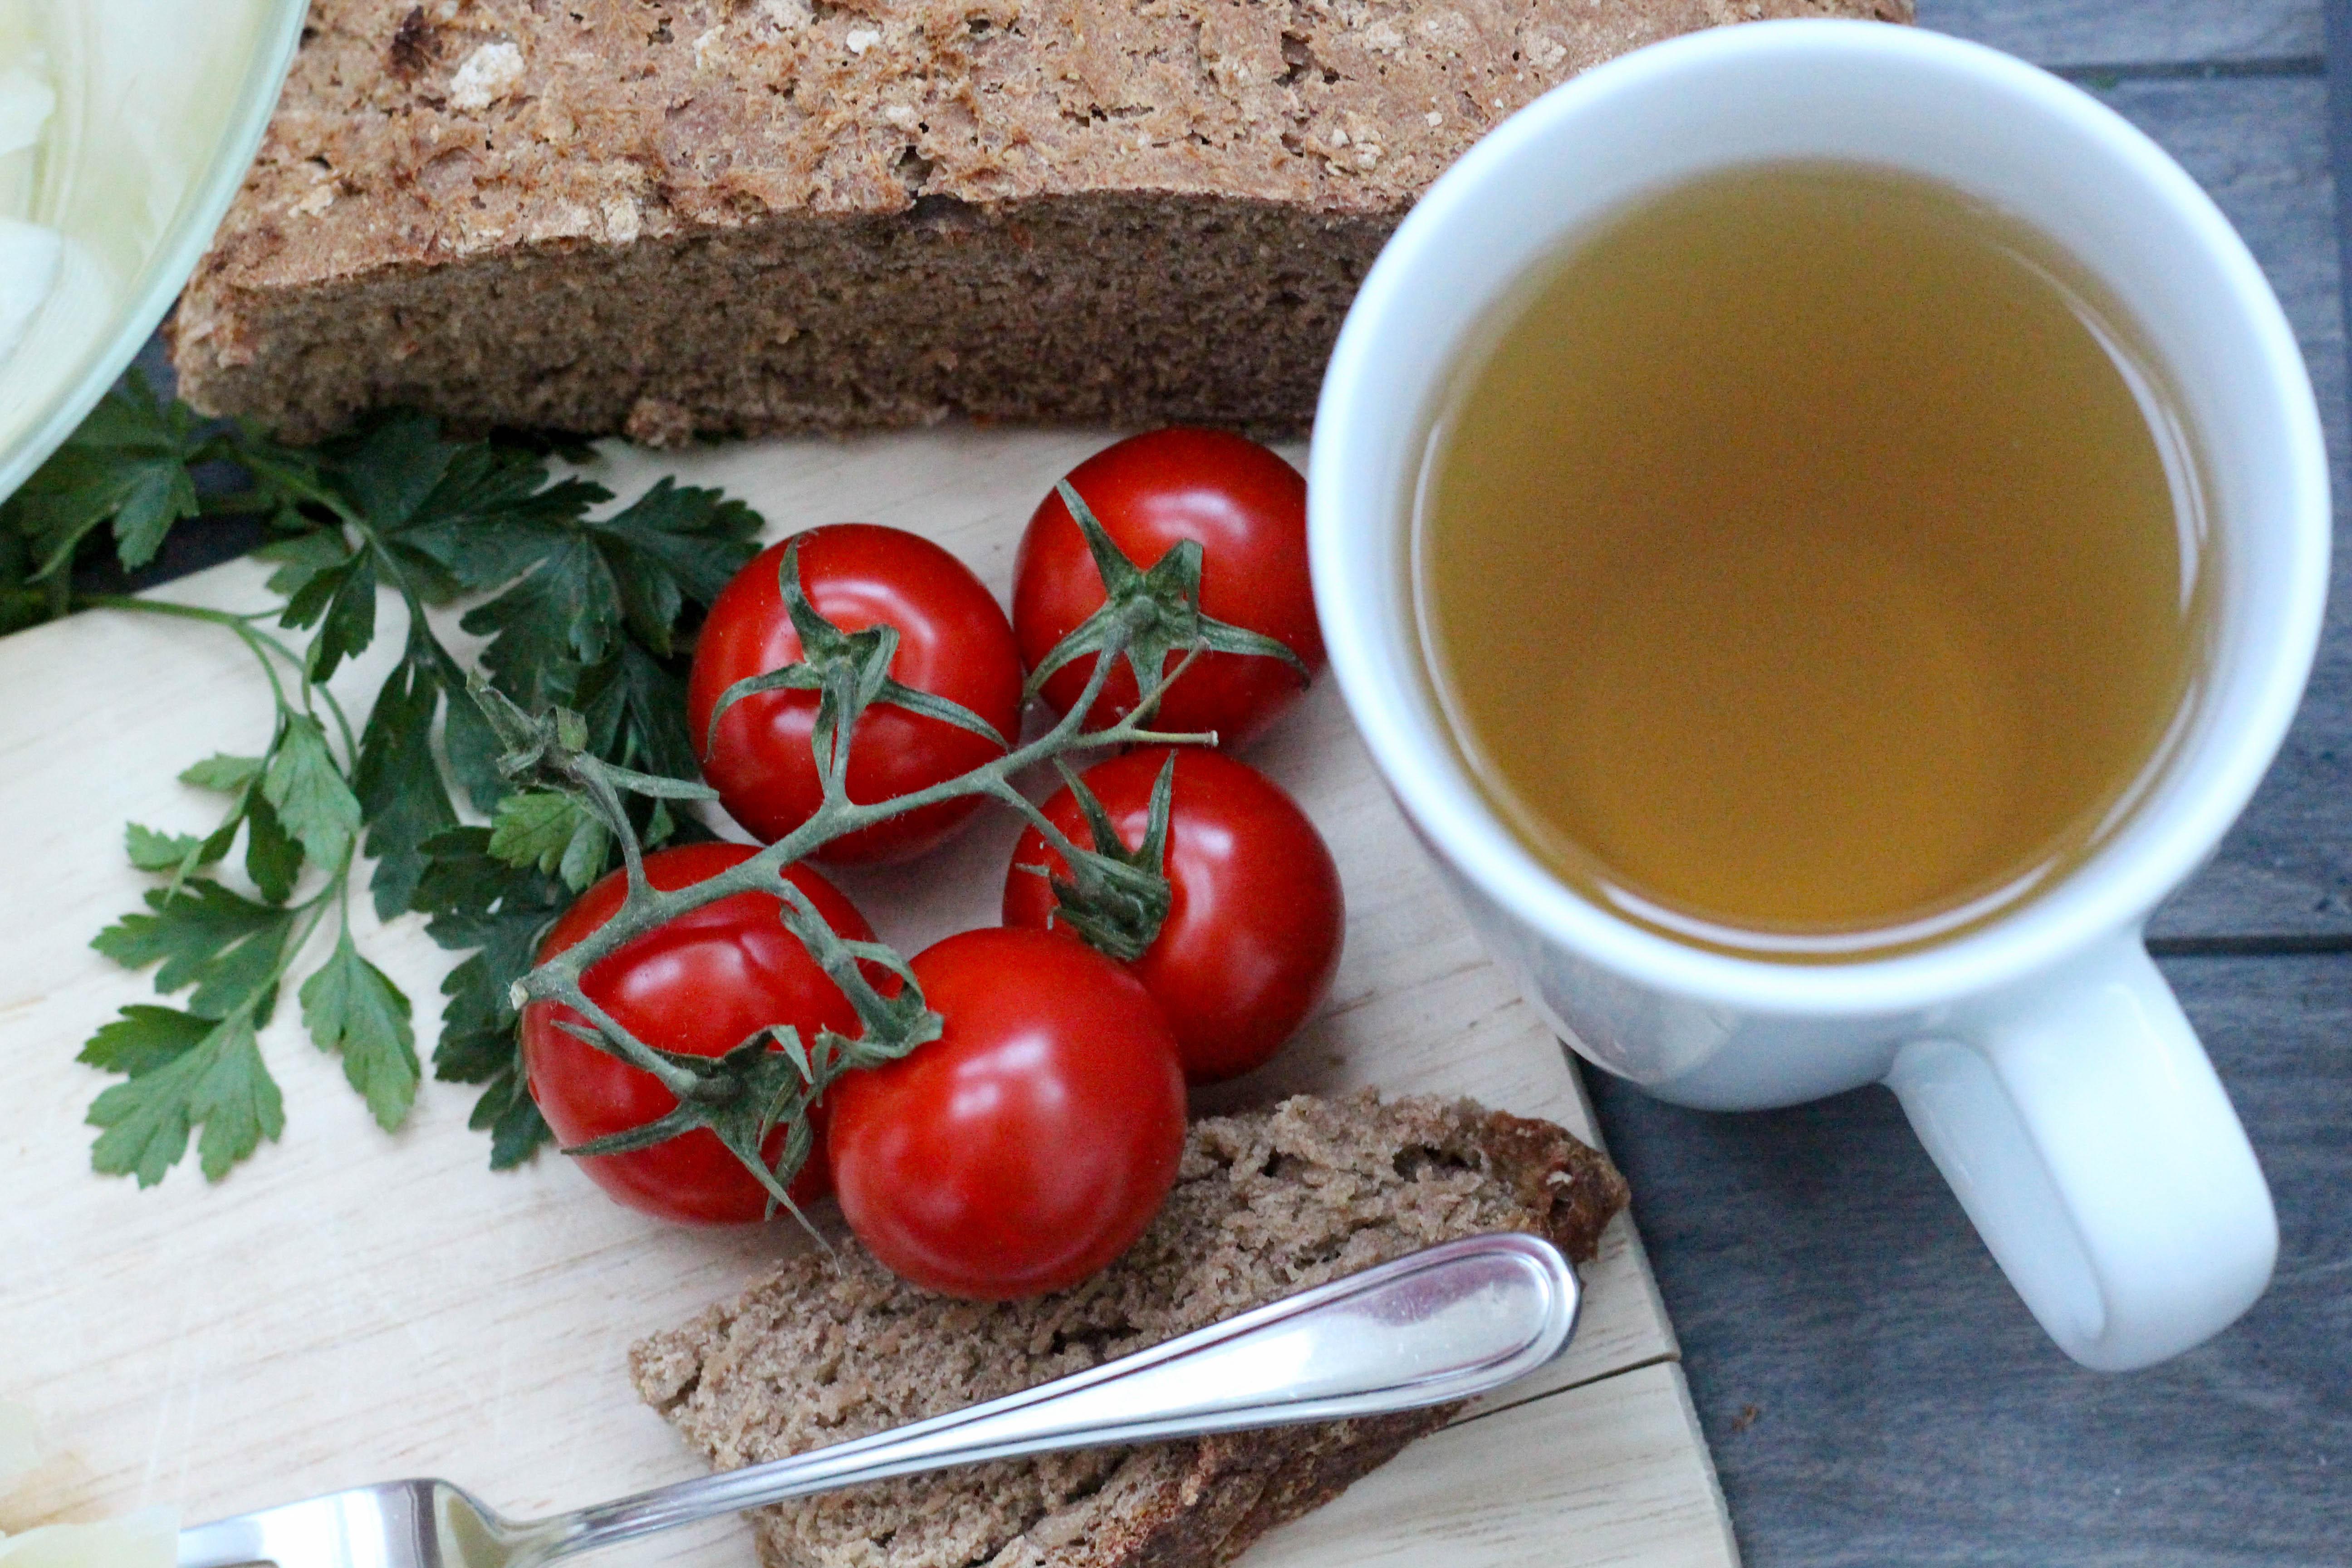 vegan-kohlrabisalat-raeuberstochter-kamillentee-brot-soulfood-homespa-plantbased-1-von-1-2